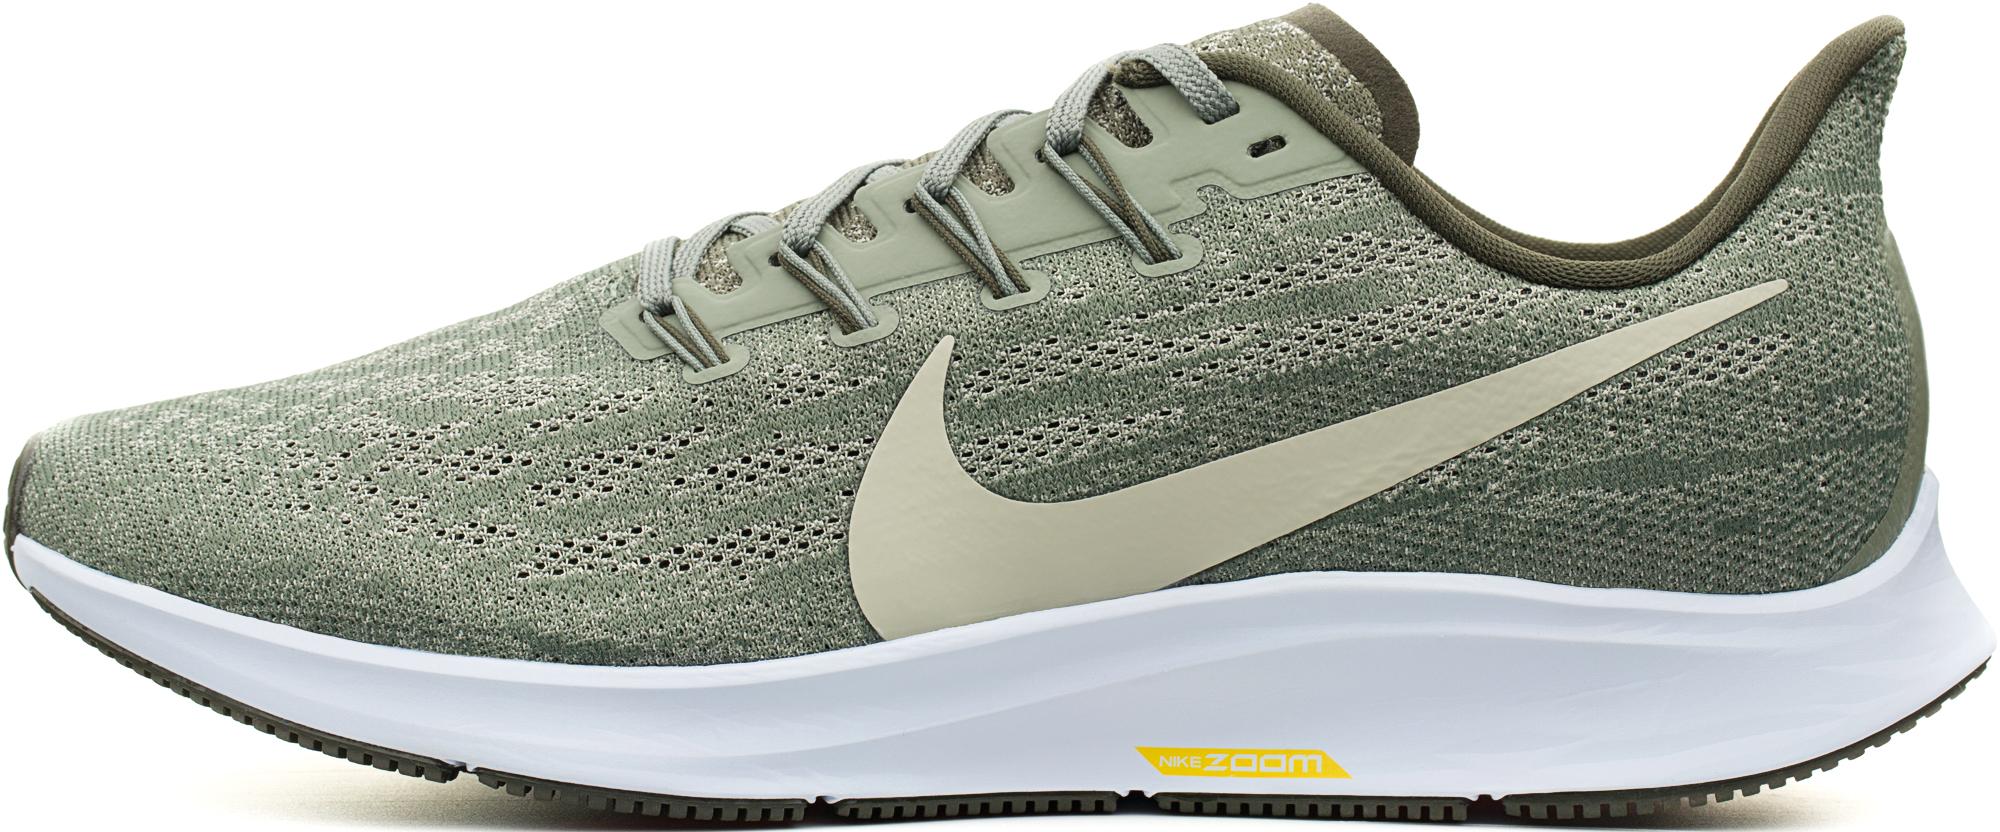 Nike Кроссовки мужские Nike Air Zoom Pegasus 36, размер 44 nike кроссовки мужские nike air zoom vapor x clay размер 45